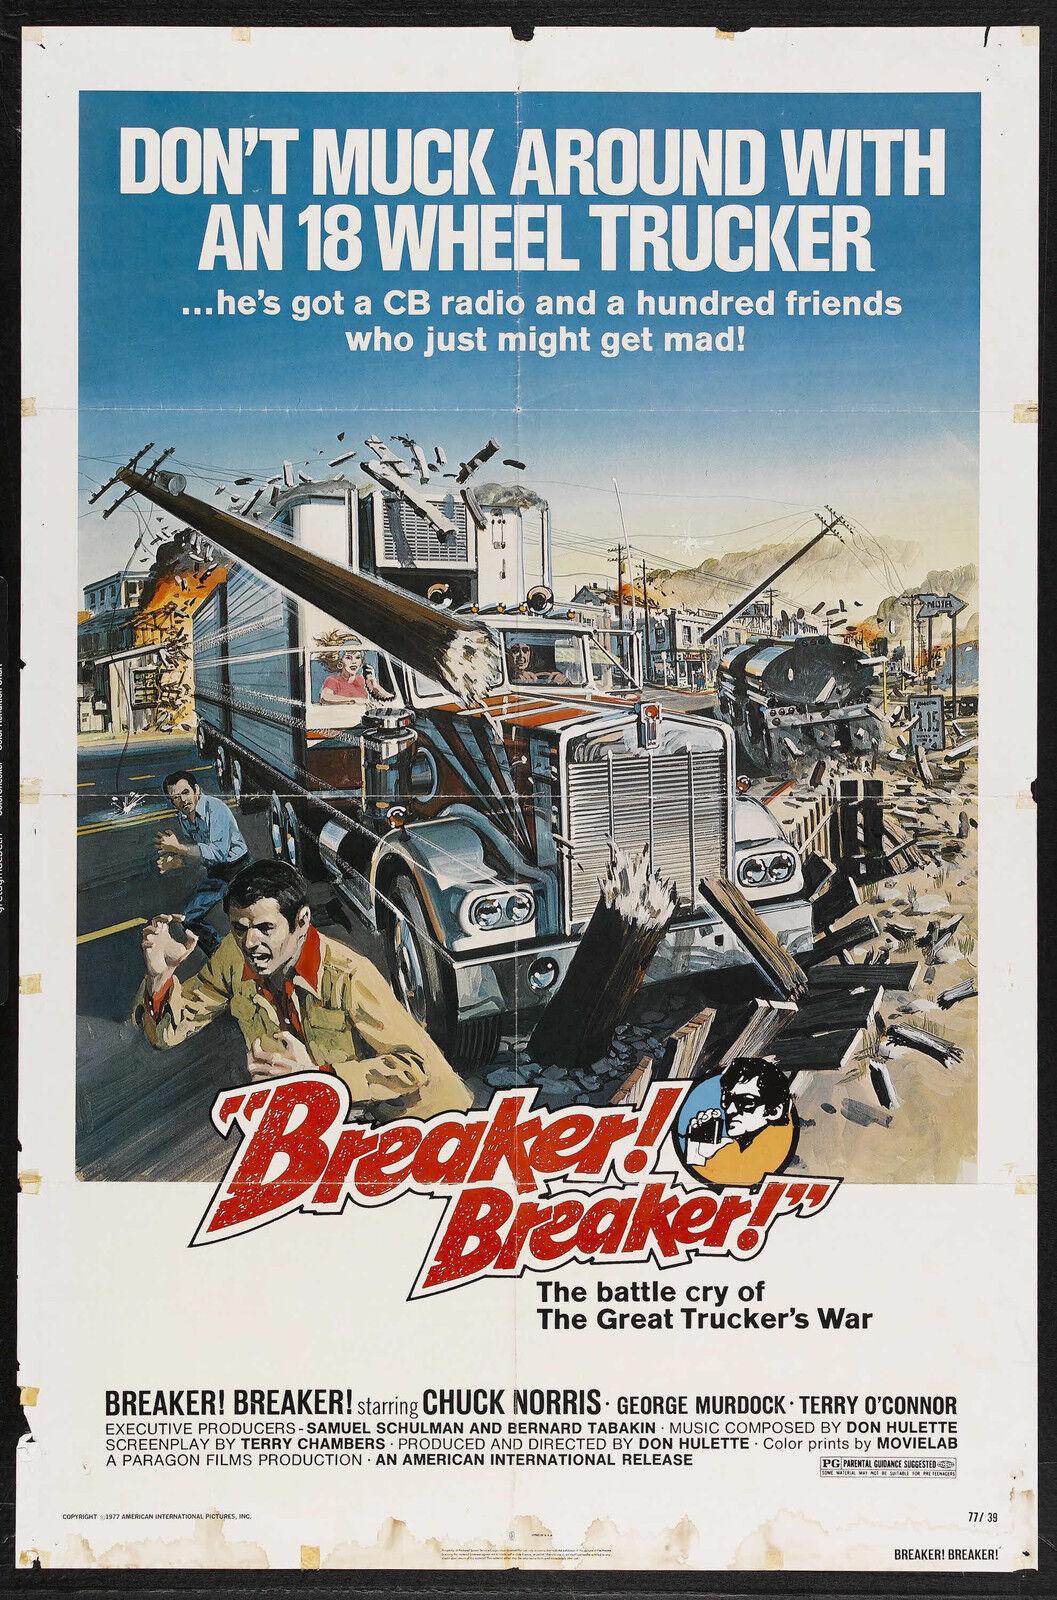 grindhouse poster template - breaker breaker movie poster 1977 chuck norris grindhouse